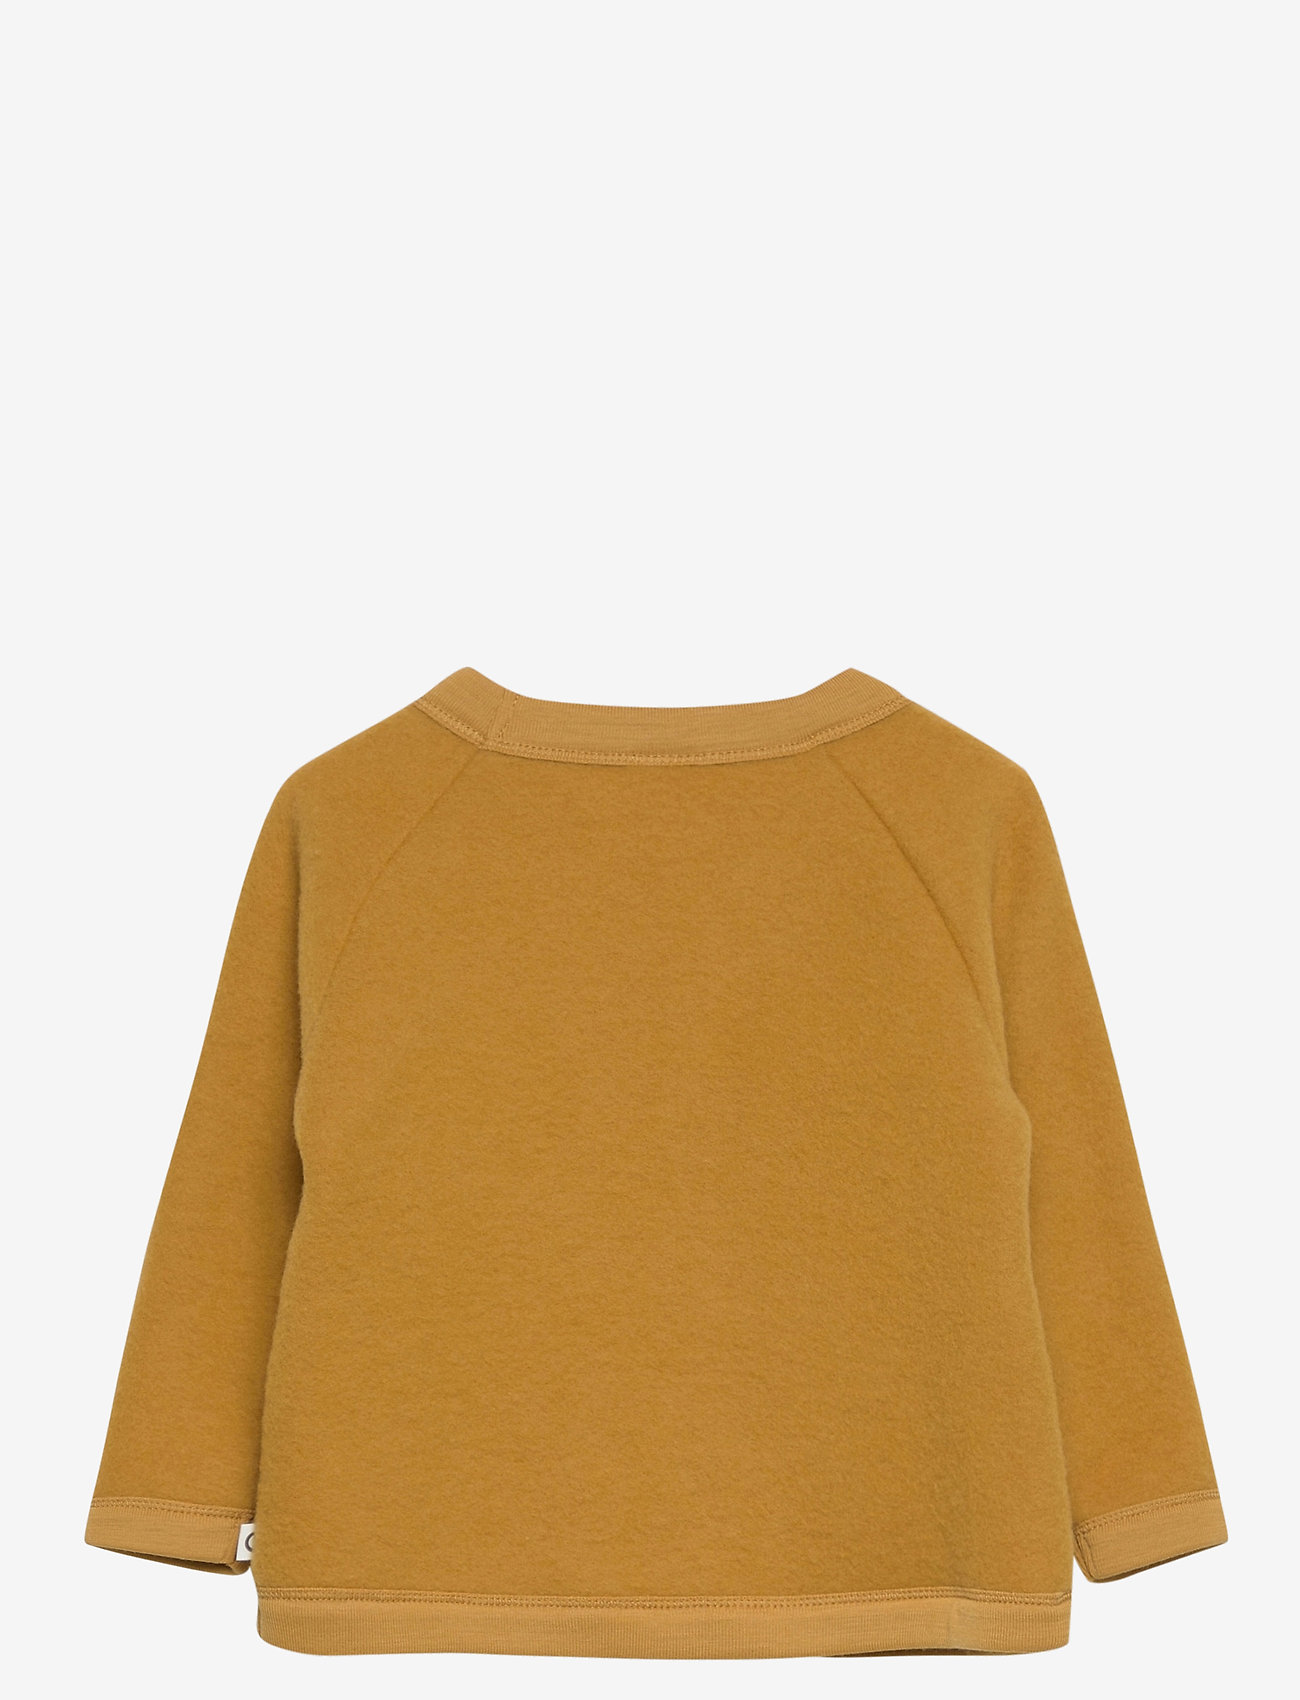 Müsli by Green Cotton - Woolly fleece jacket baby - gilets - wood - 1